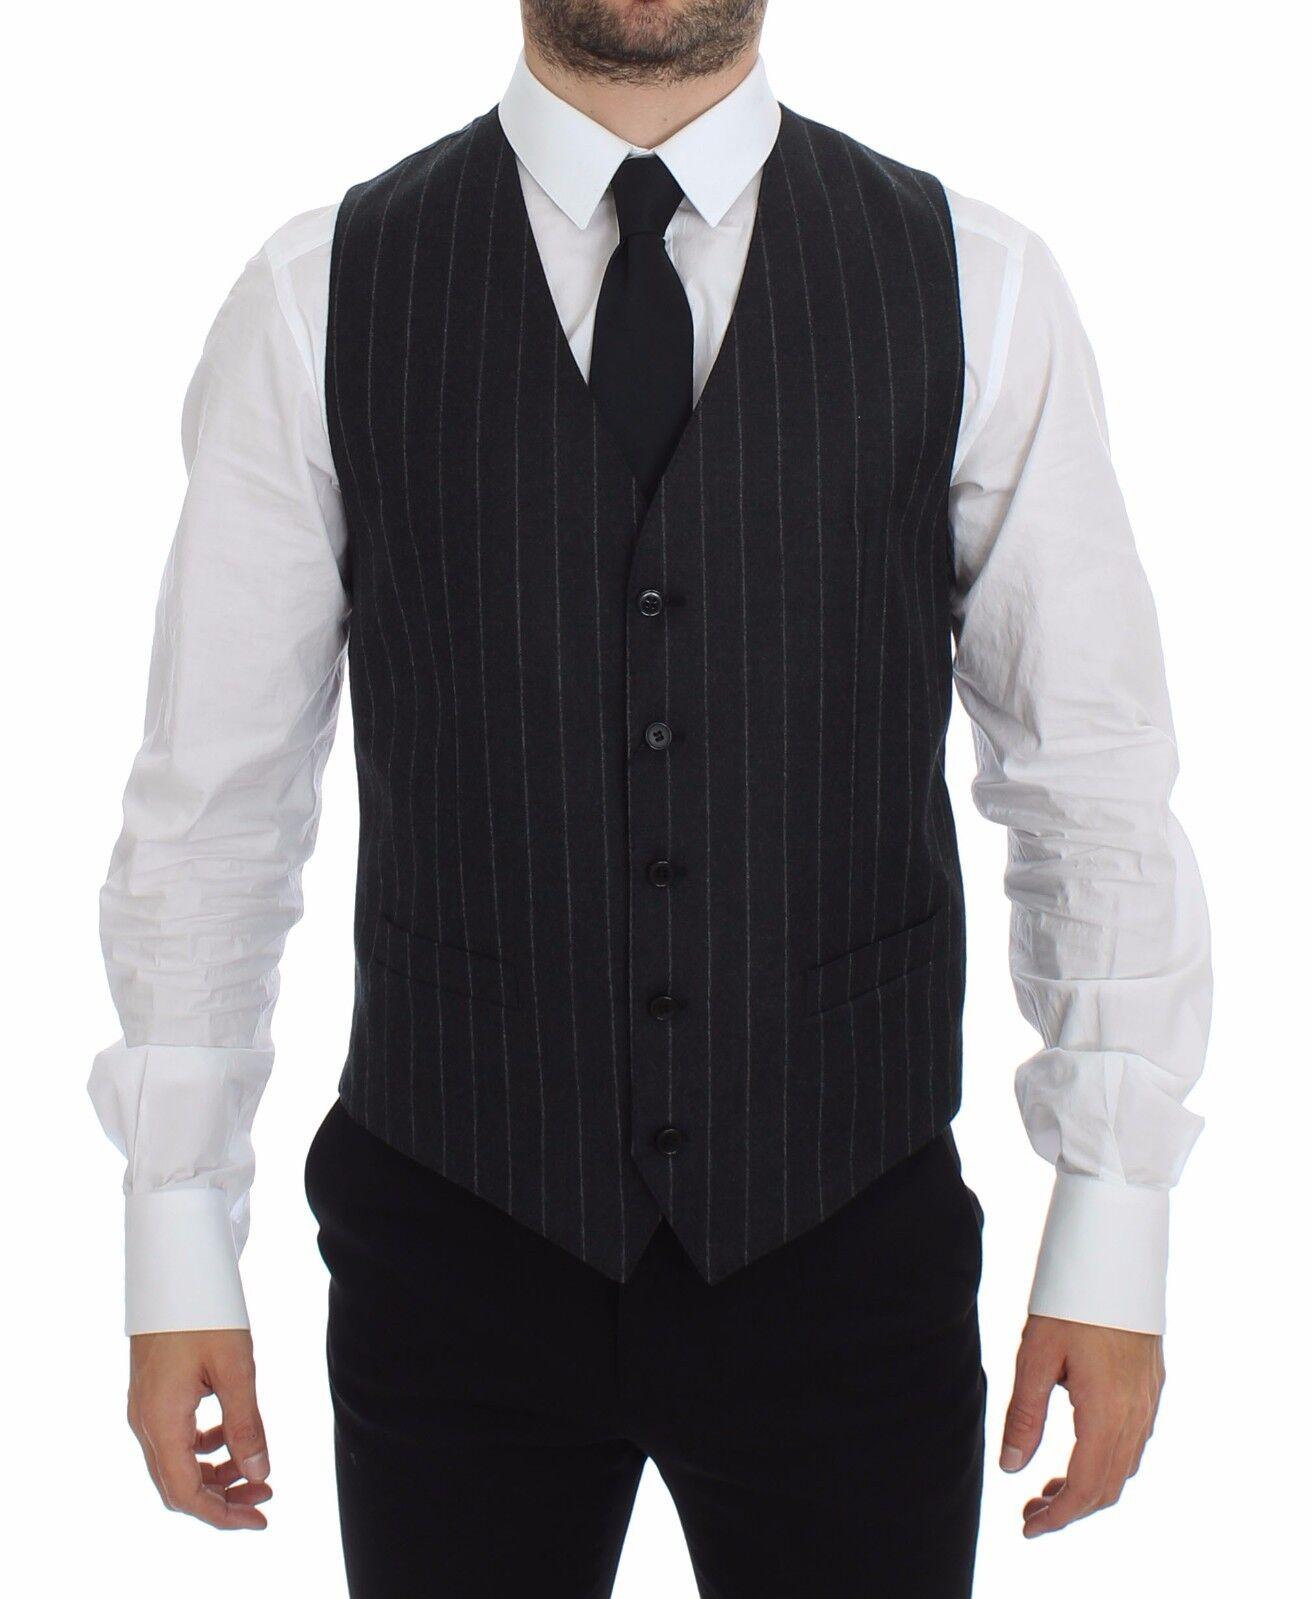 NWT DOLCE & GABBANA grau Striped Wool Logo Vest Waistcoat IT48 / US38 / M